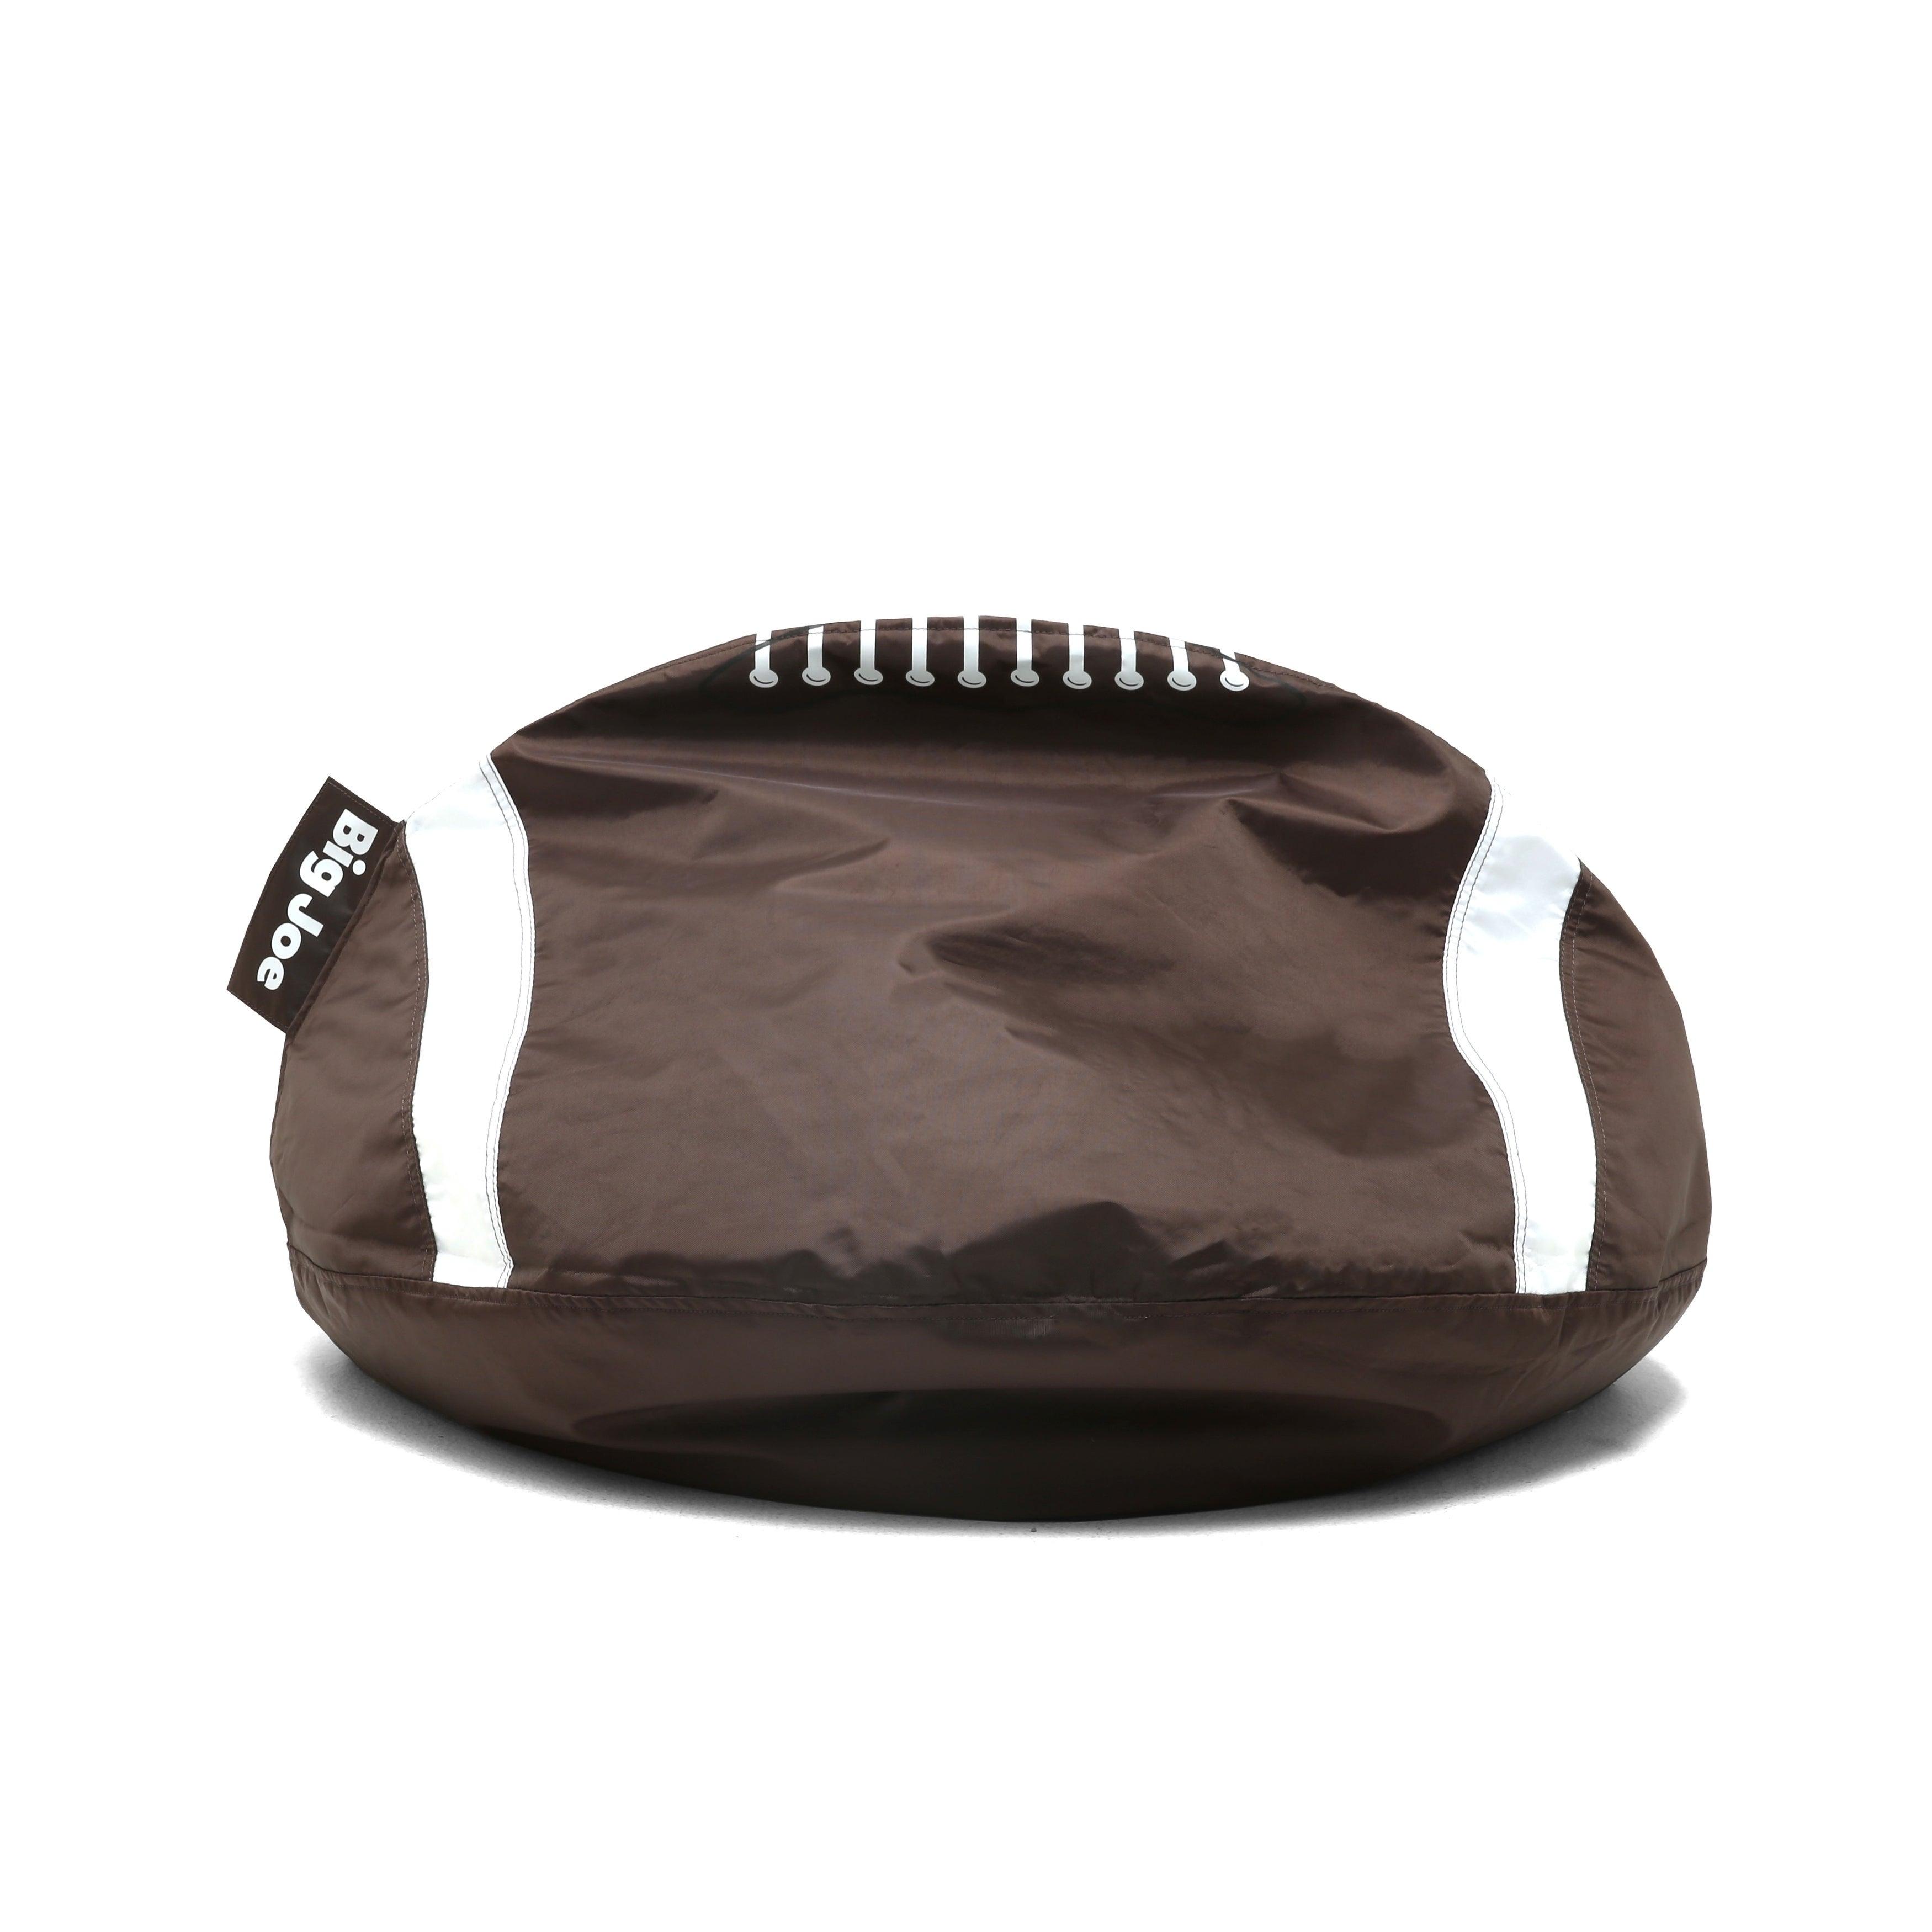 Marvelous Big Joe Football Bean Bag Chair Ibusinesslaw Wood Chair Design Ideas Ibusinesslaworg